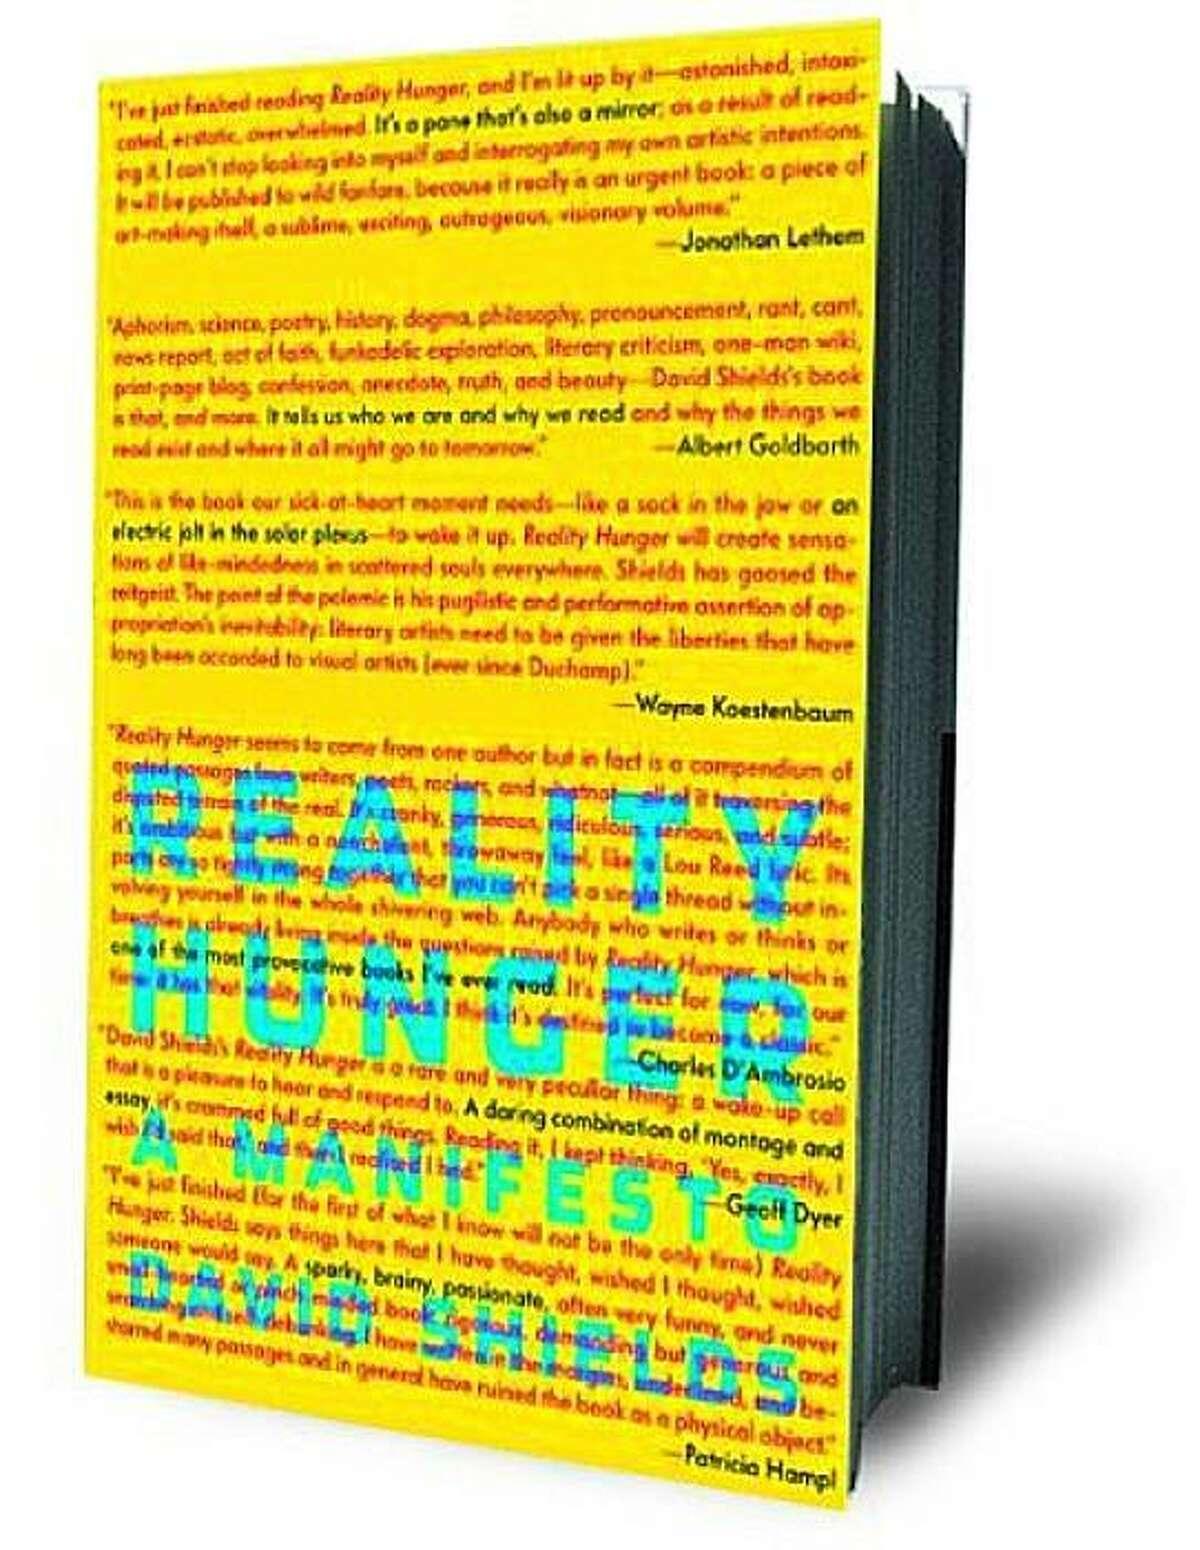 Reality Hunger: A Manifesto by David Shields